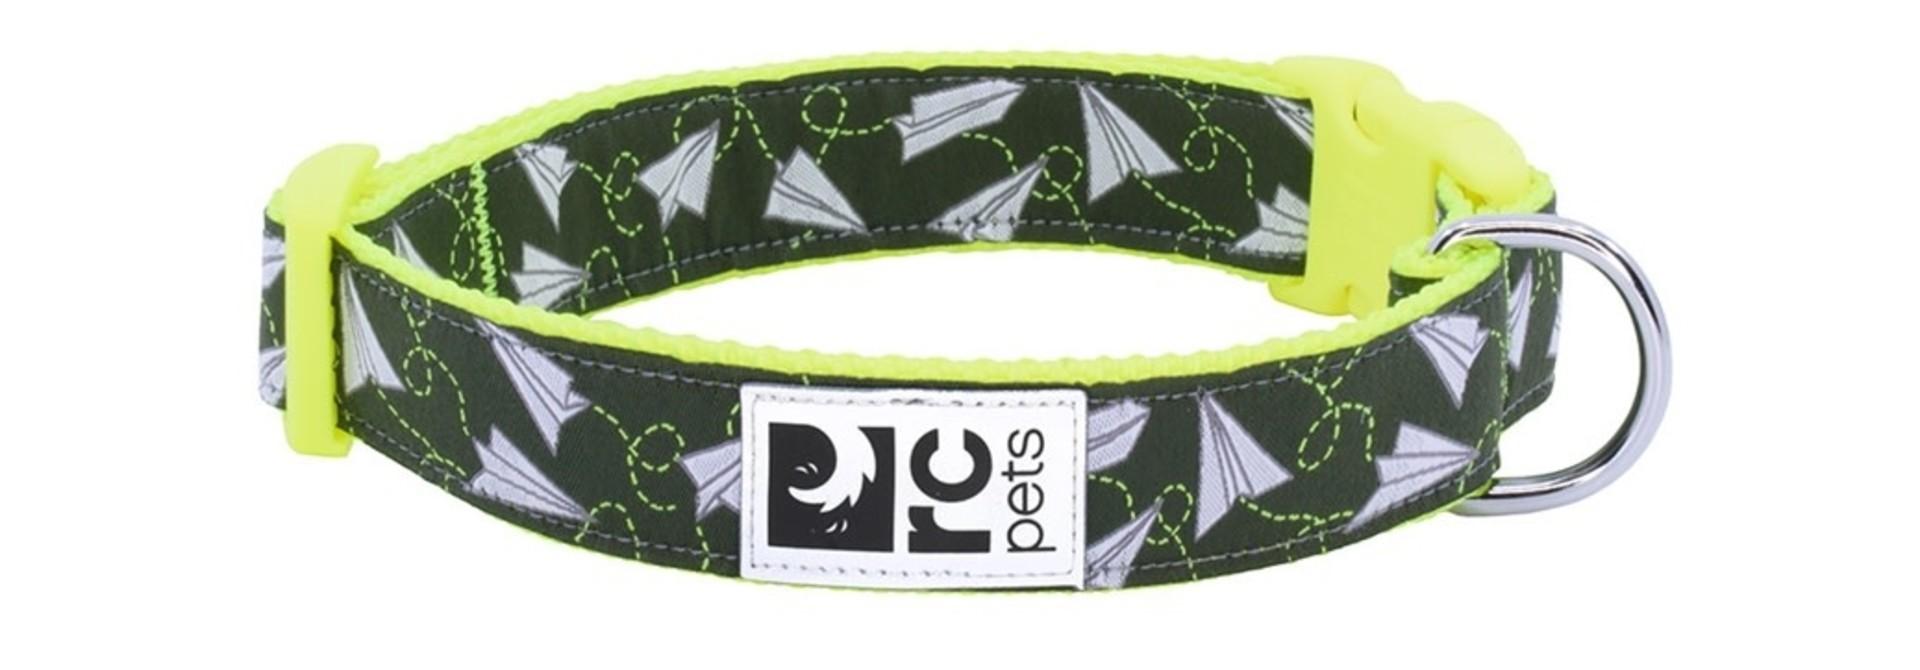 Clip Collar XS 5/8 Paper Planes